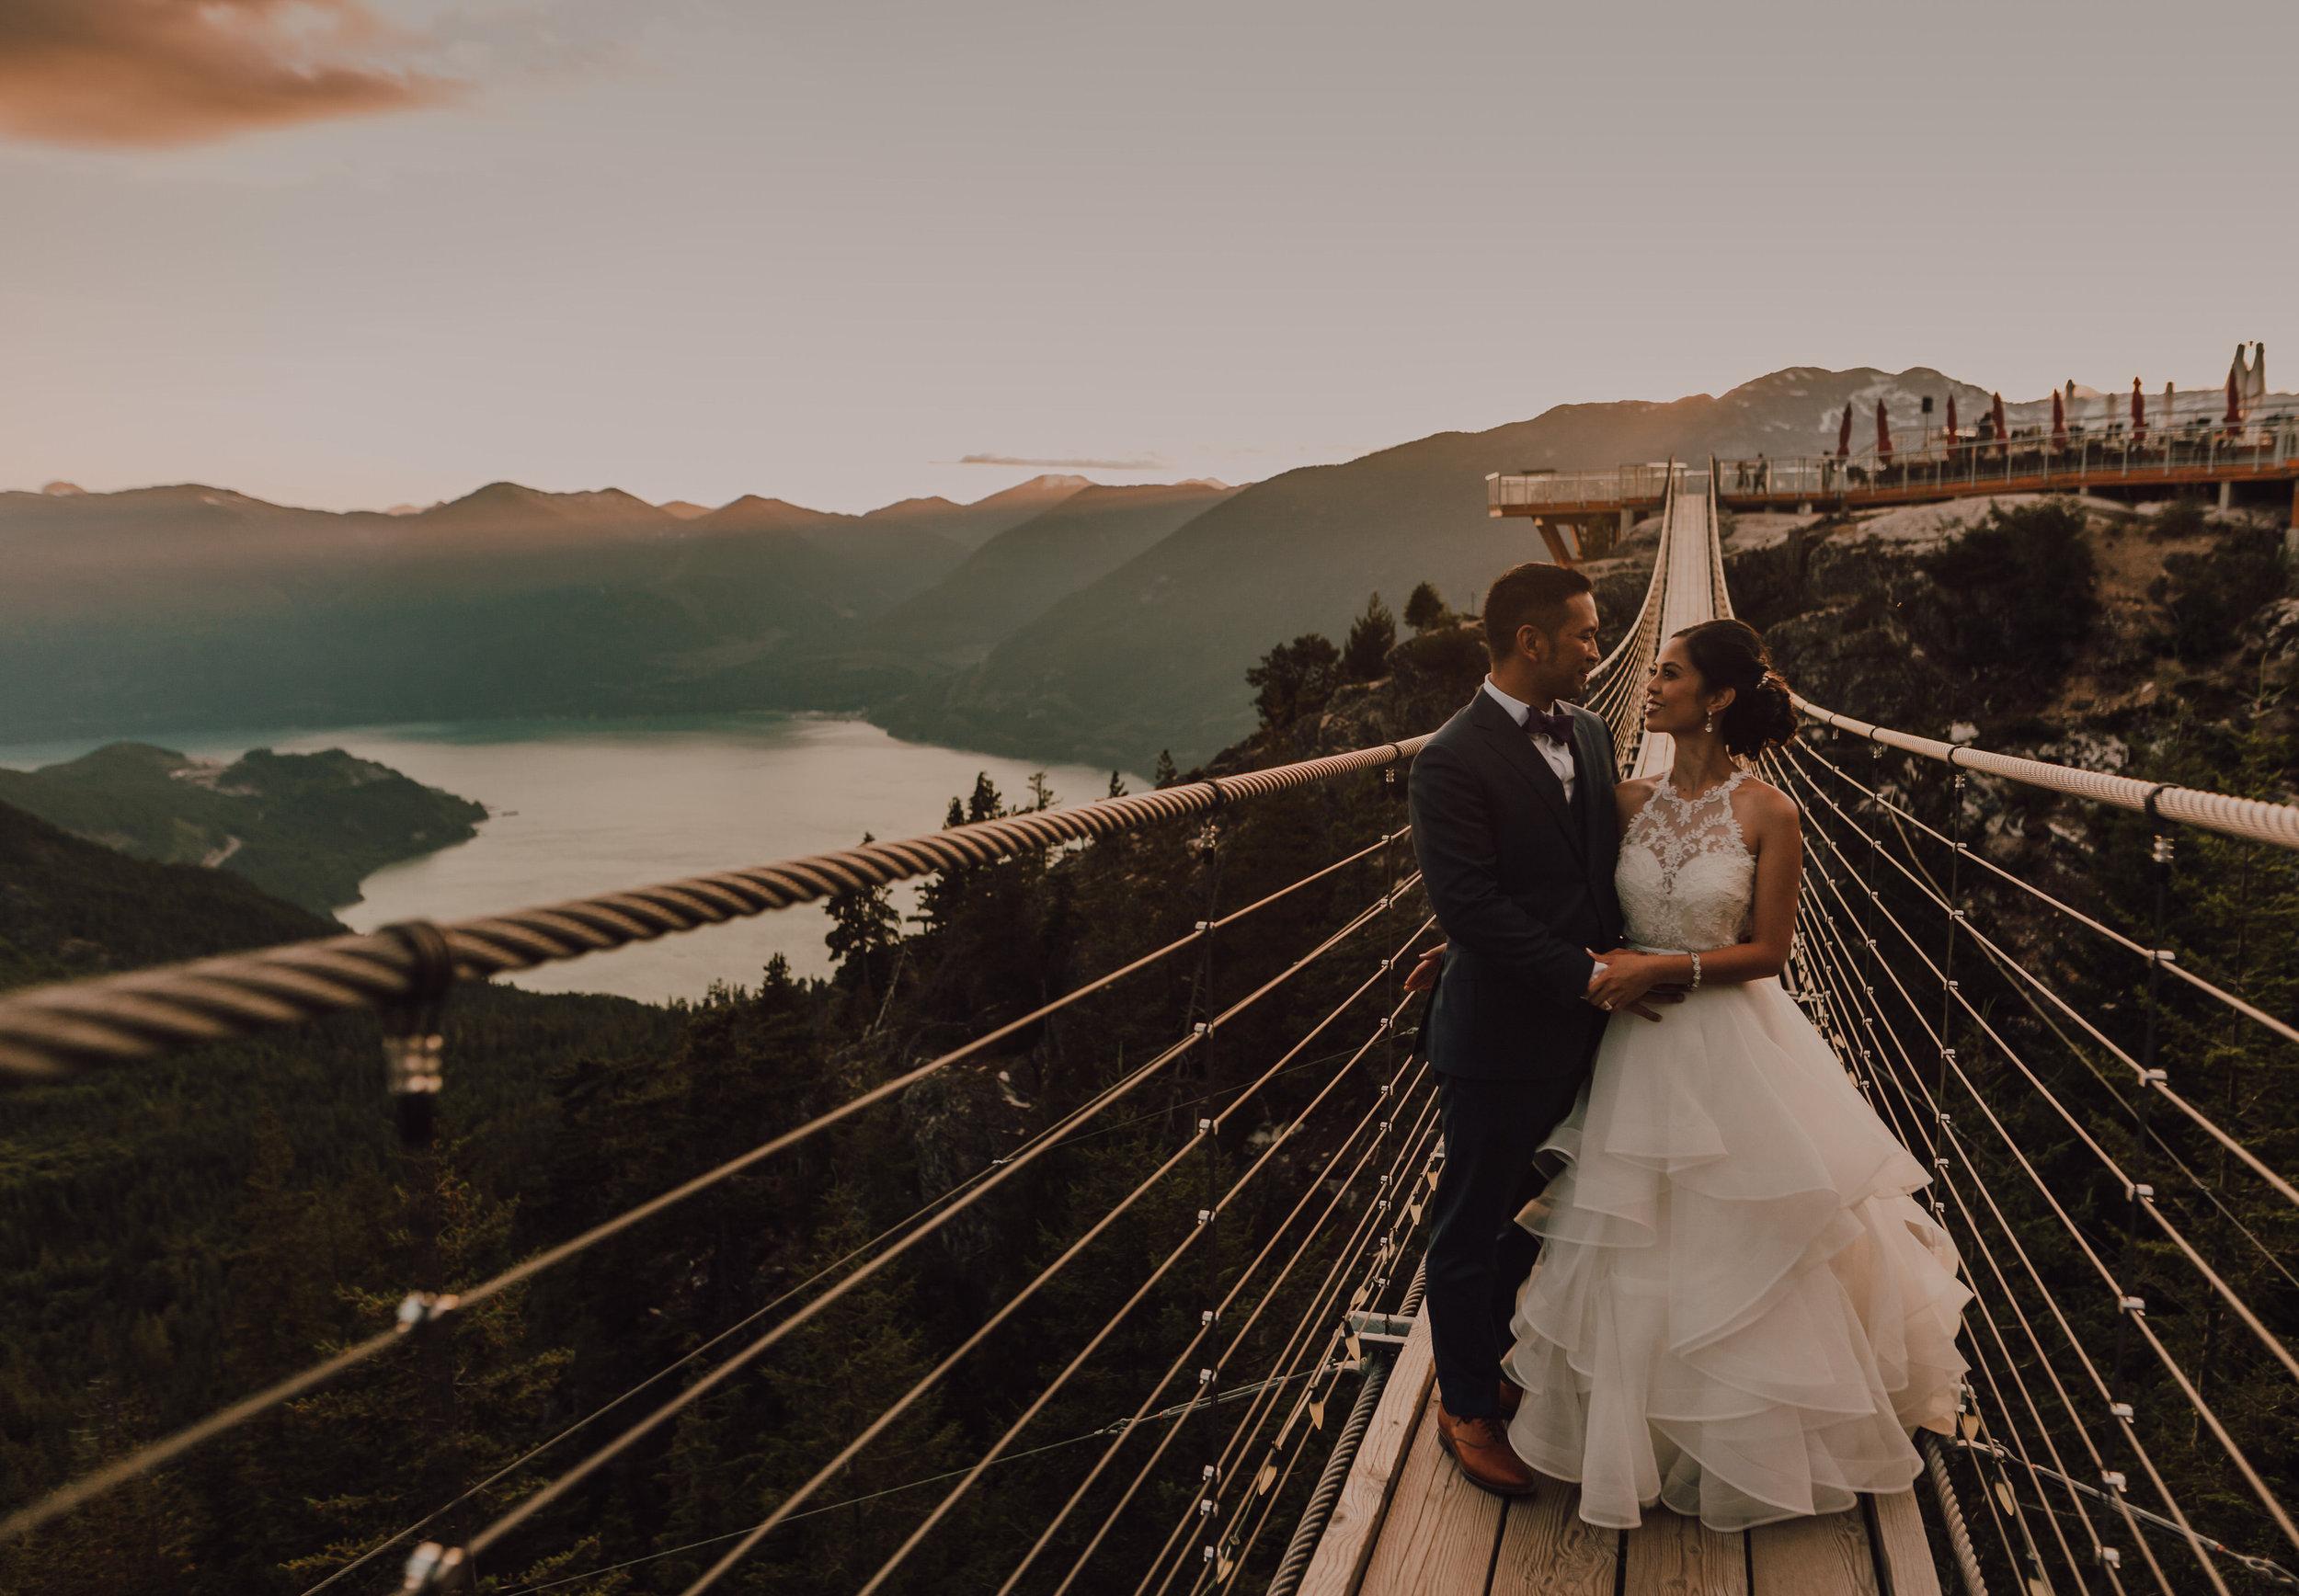 Squamish Wedding Photographer - Sea to Sky Gondola Wedding Photos -  Vancouver Wedding Photographer & Videographer - Sunshine Coast Wedding Photos - Sunshine Coast Wedding Photographer - Jennifer Picard Photography - IMG_5322.jpg